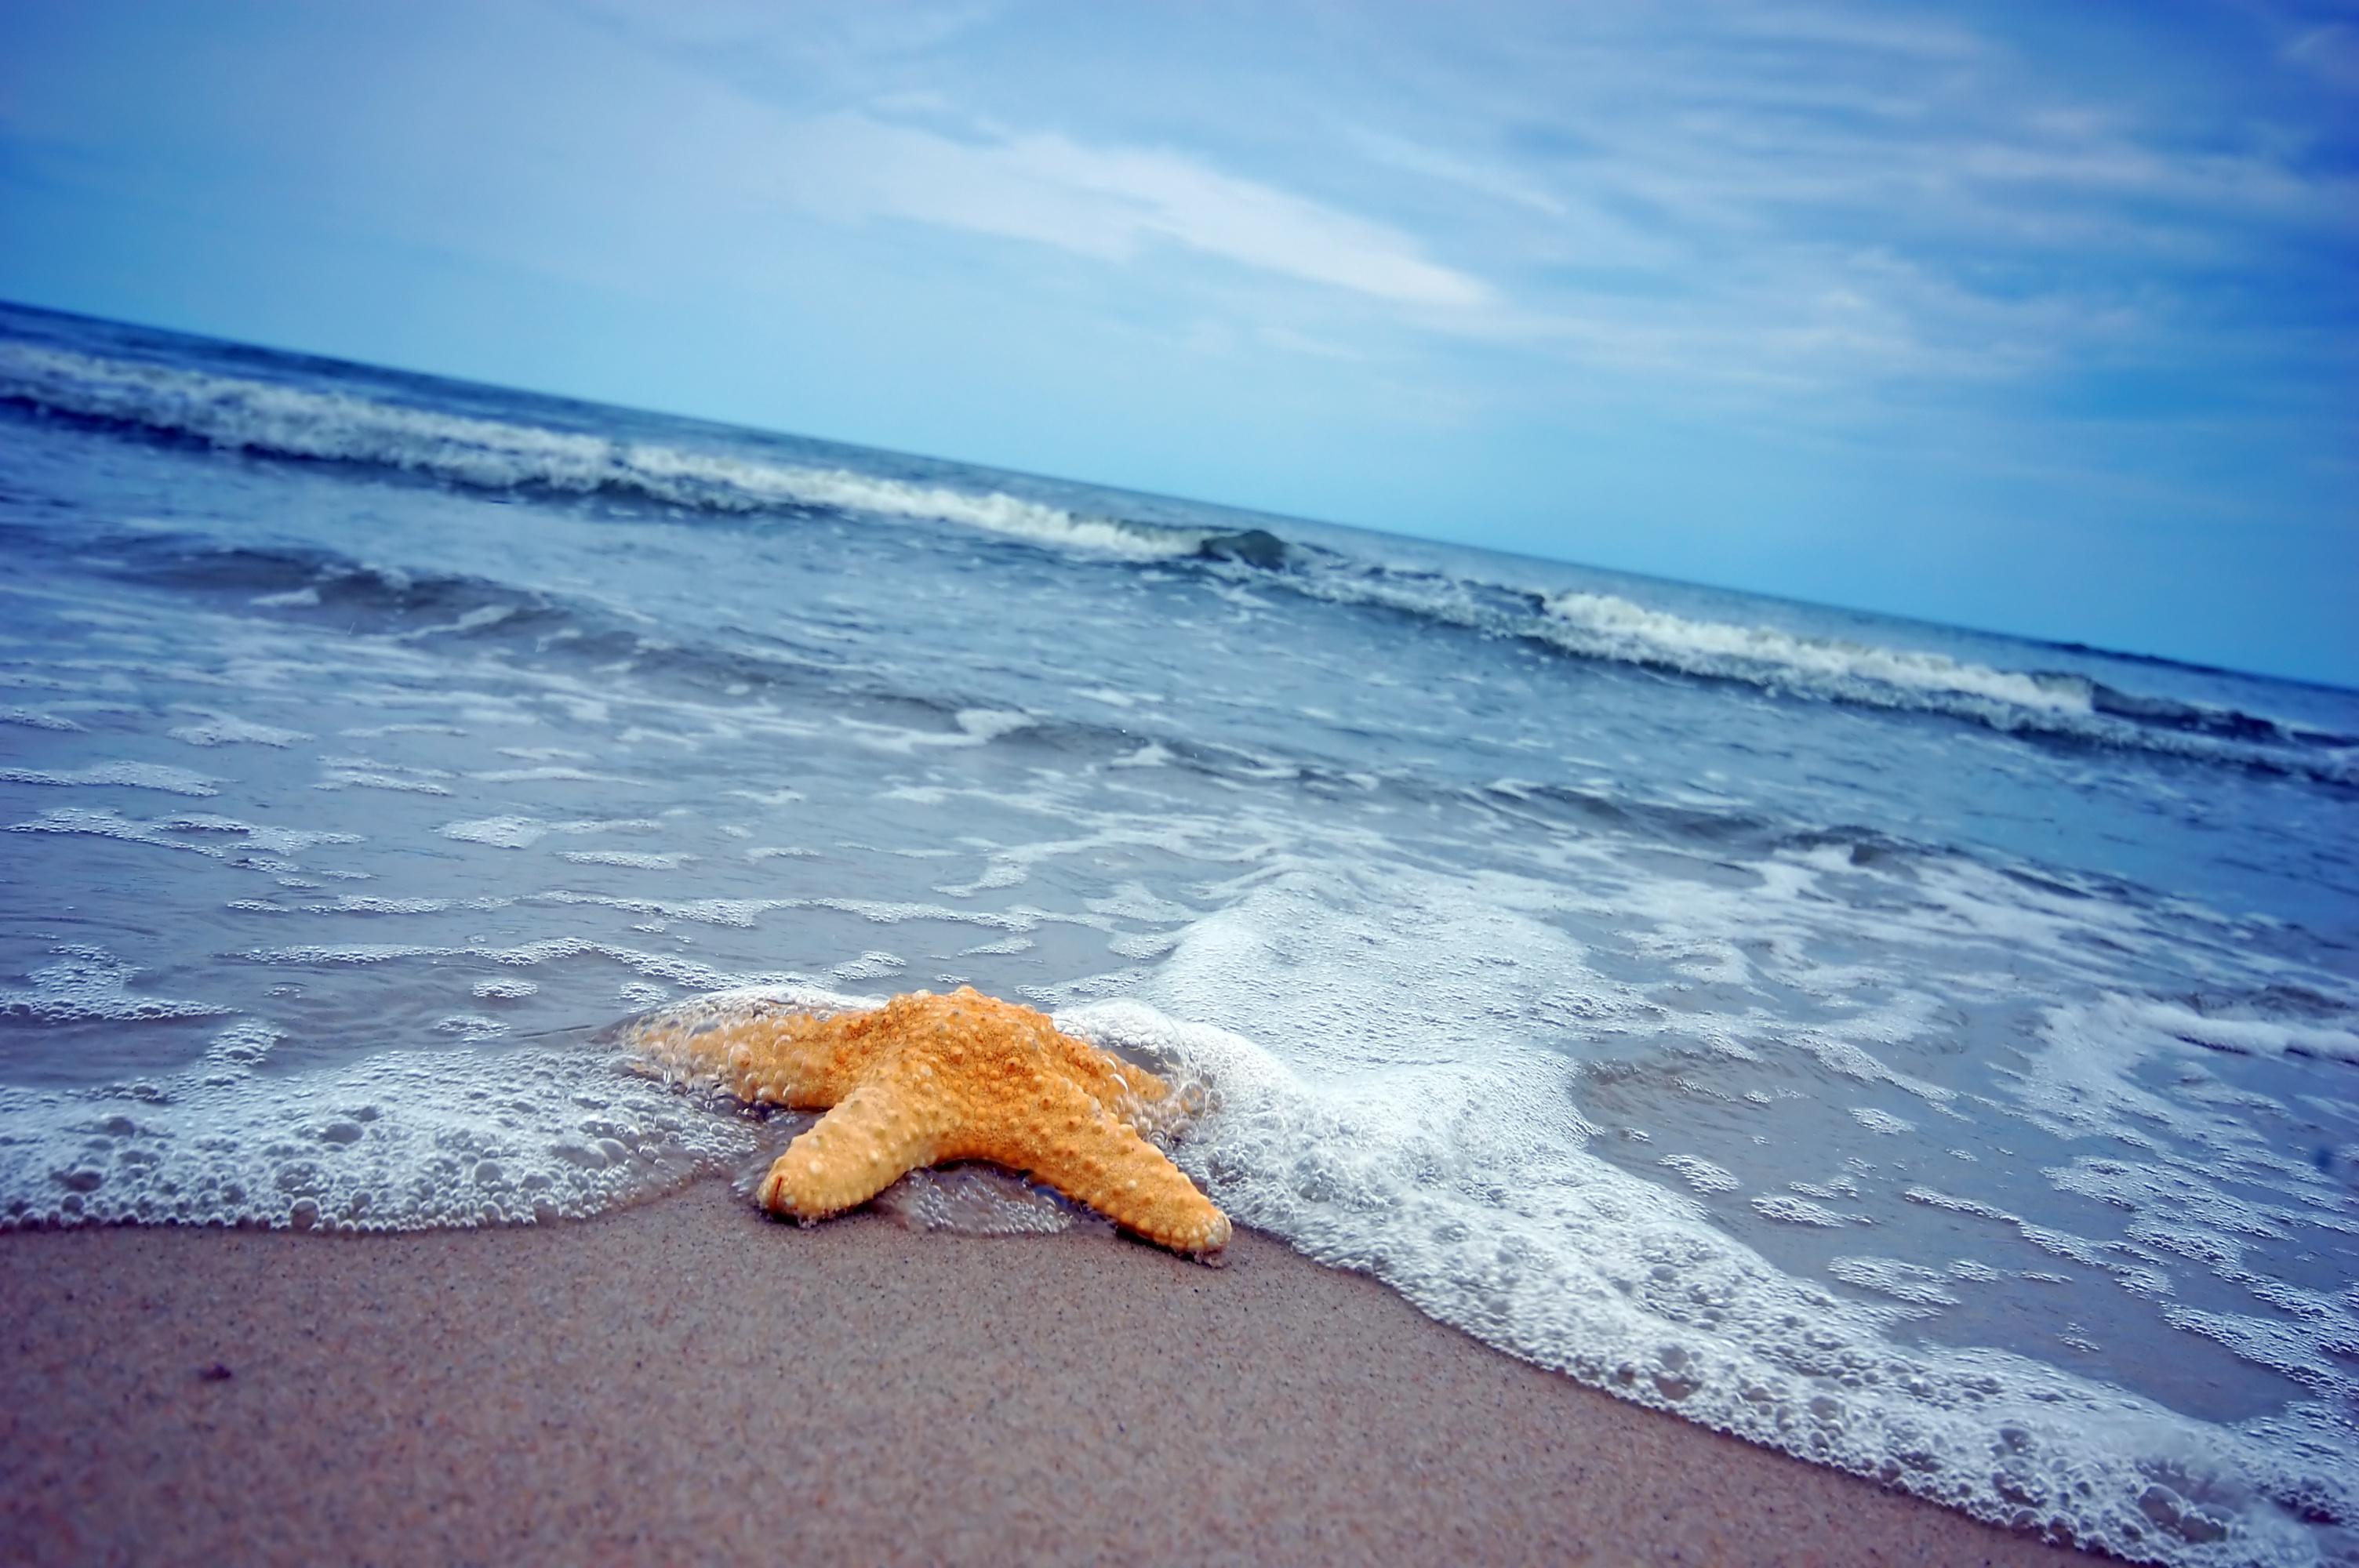 песок на берегу моря картинки тайланде можно